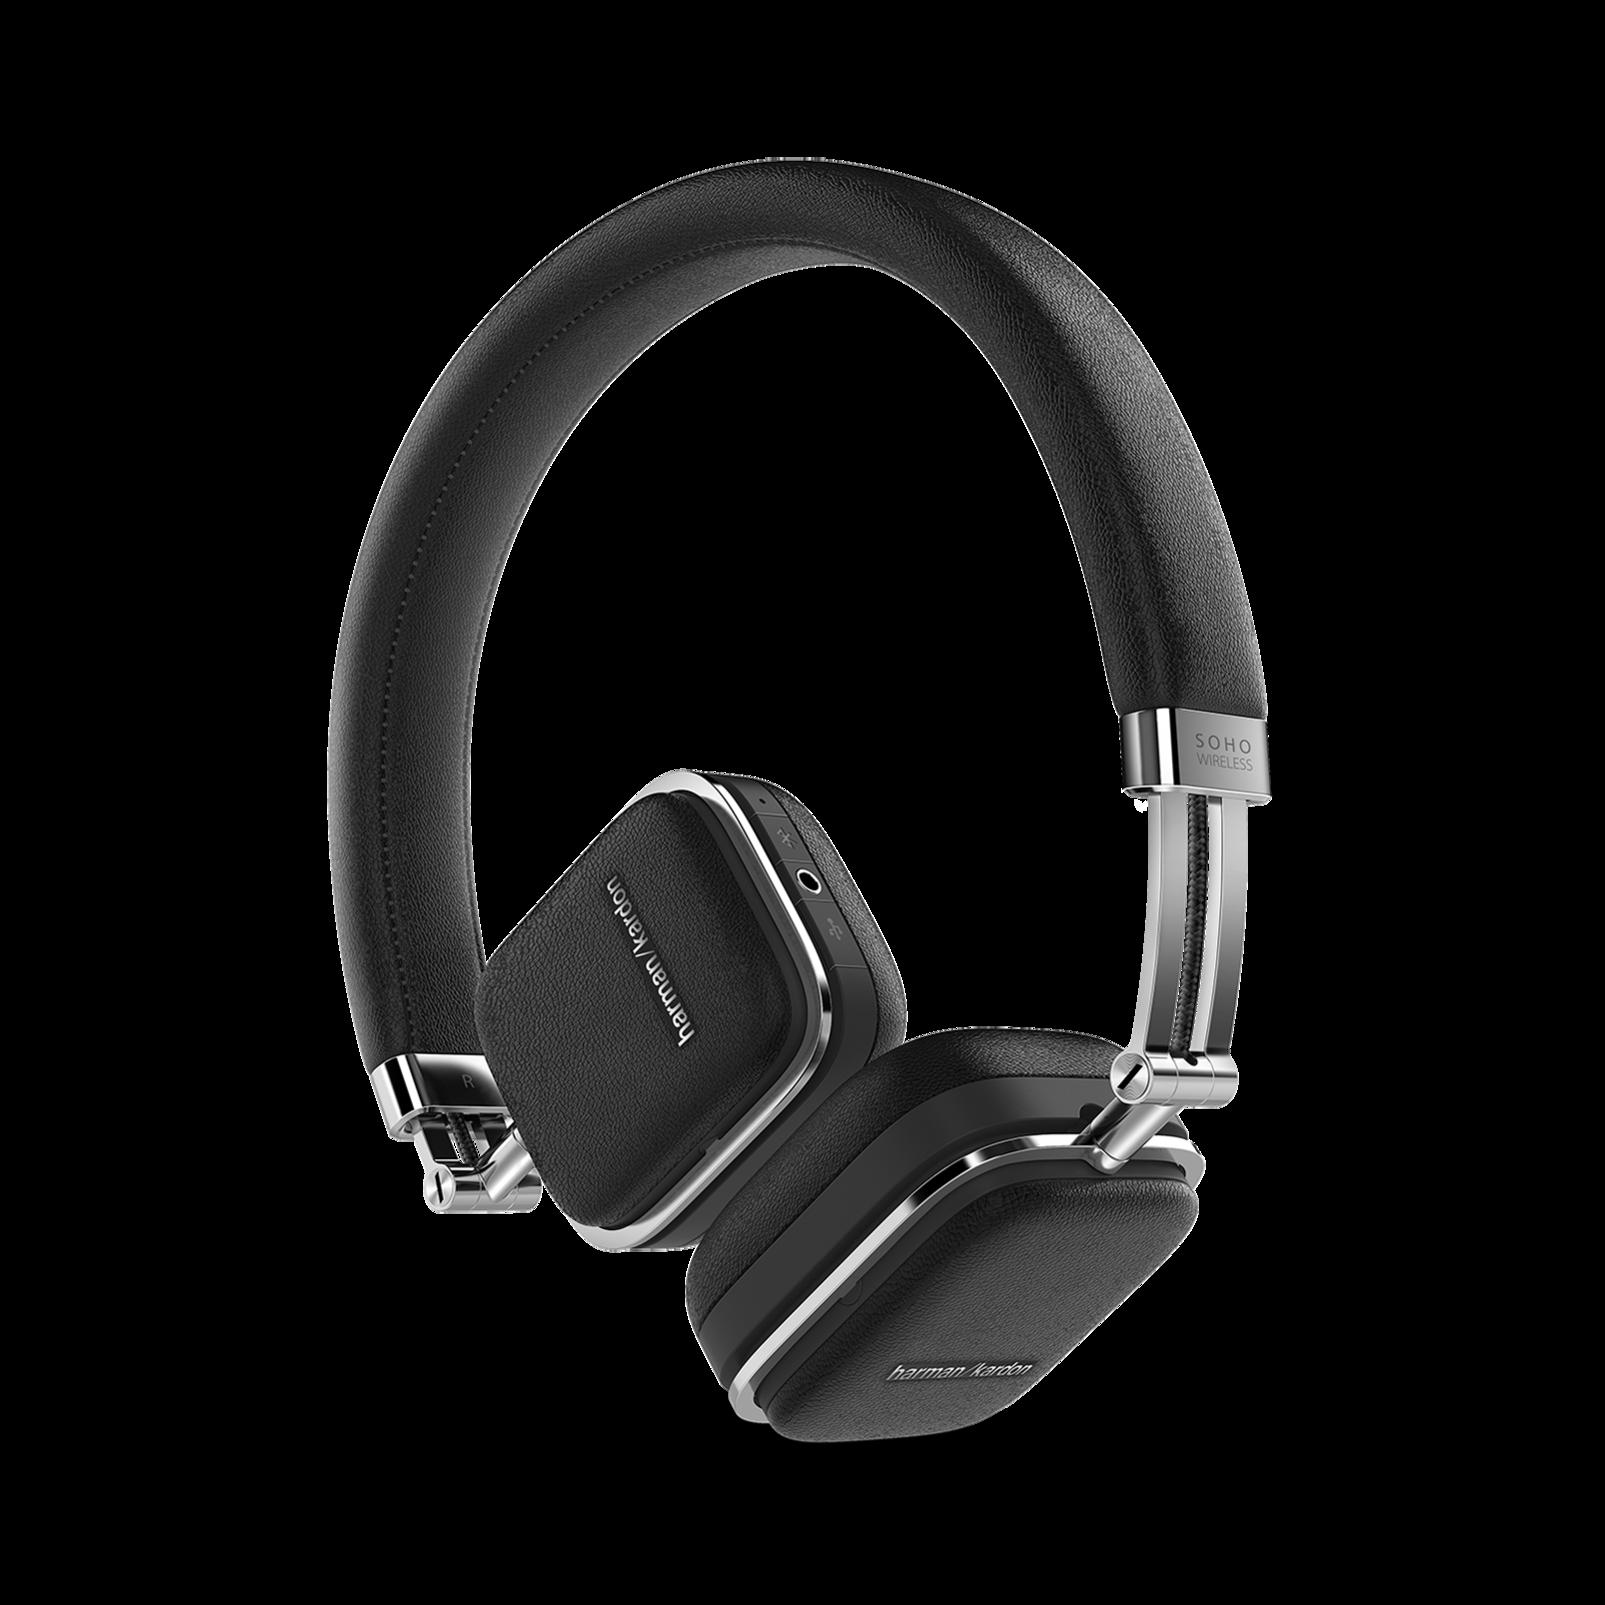 Harman Kardon SOHO Wireless Premium On-Ear Bluetooth Headphones $99.95 + Free 2 Day shipping